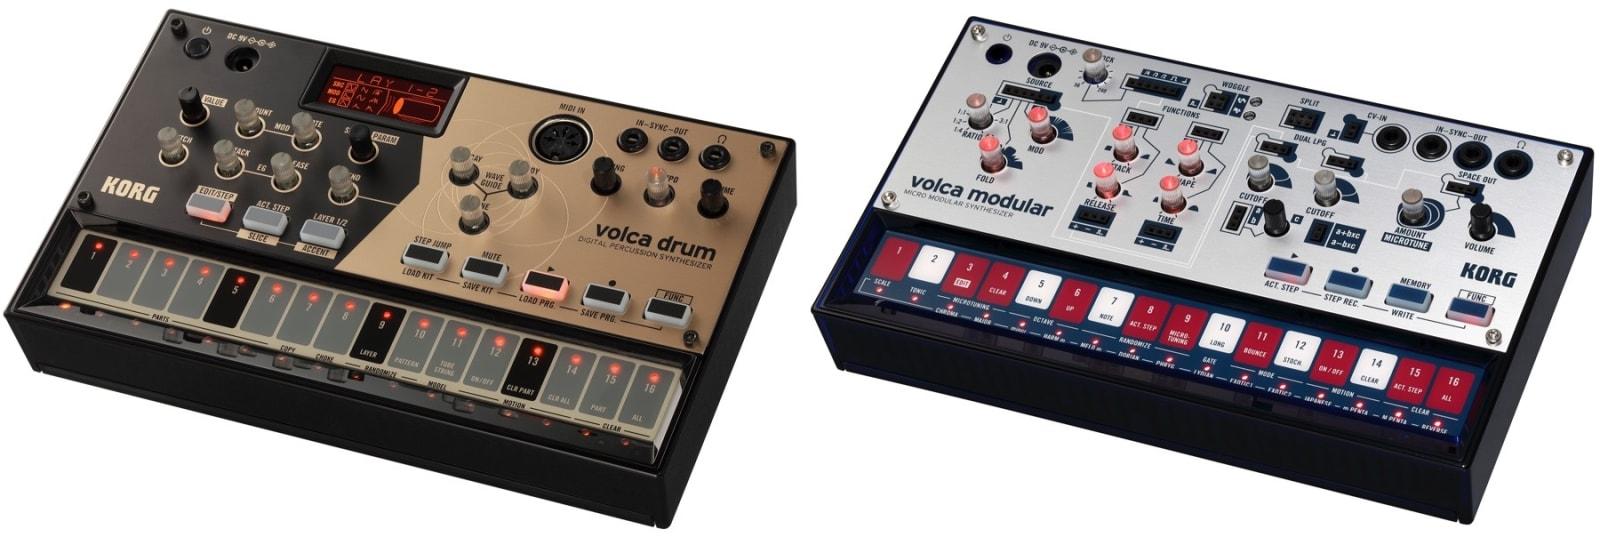 korg introduces volca modular and volca drum synths. Black Bedroom Furniture Sets. Home Design Ideas